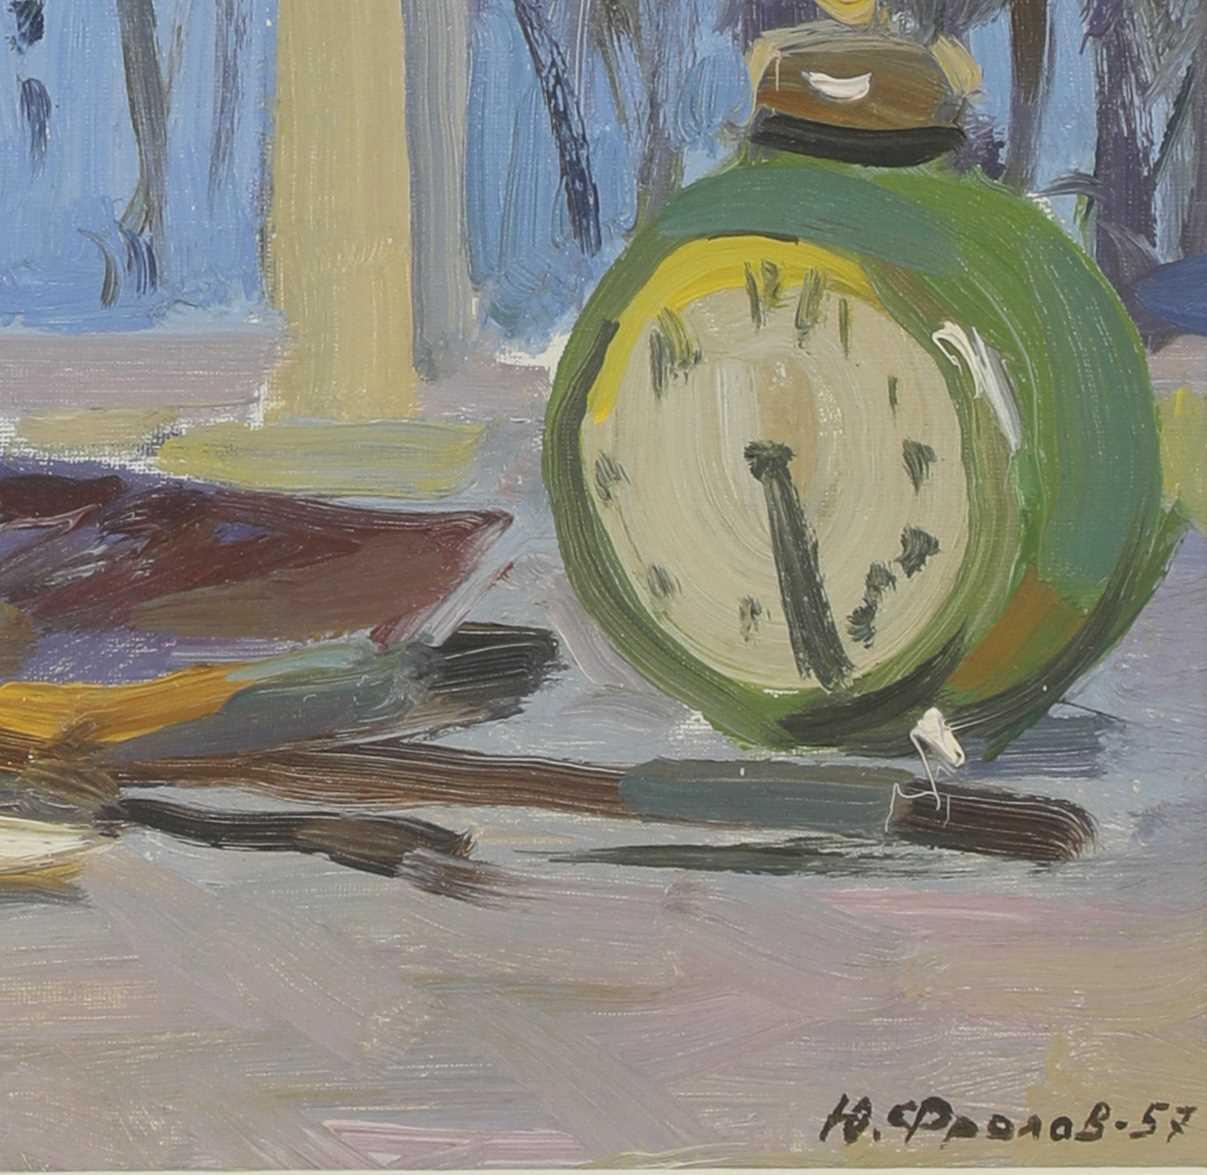 Yuri Frolov (Russian, 1925-1990) - Image 3 of 4